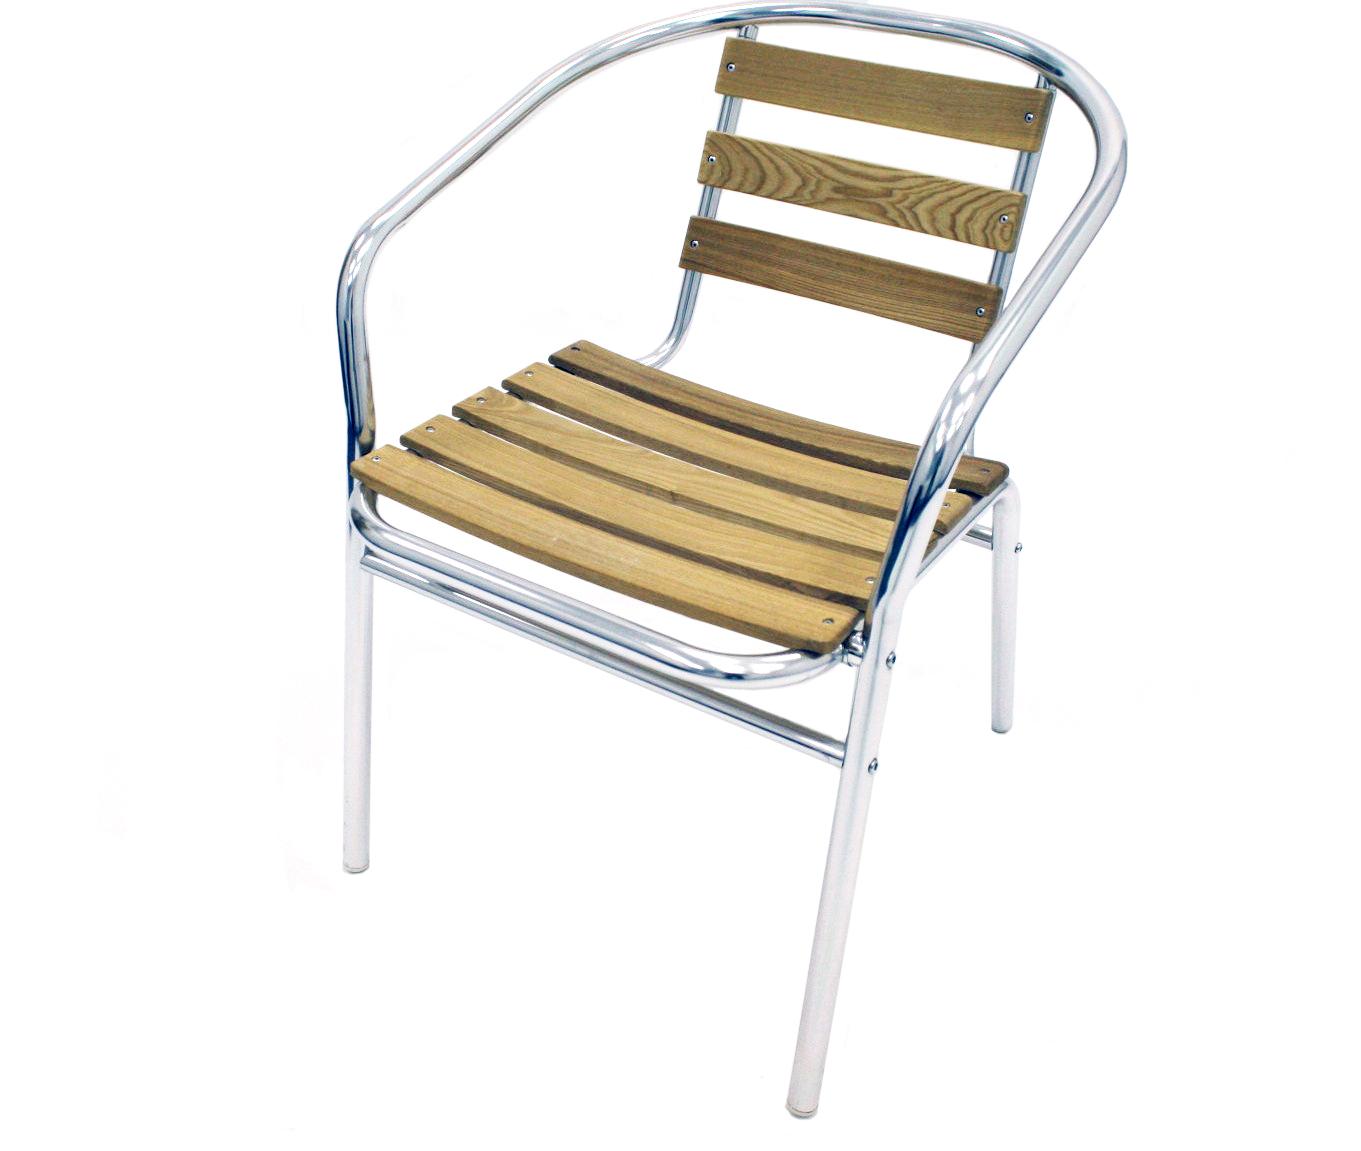 Ash Set comprising of 1 Aluminium 60cm diameter table and 4 Ash and aluminium chairs - BE Event Hire